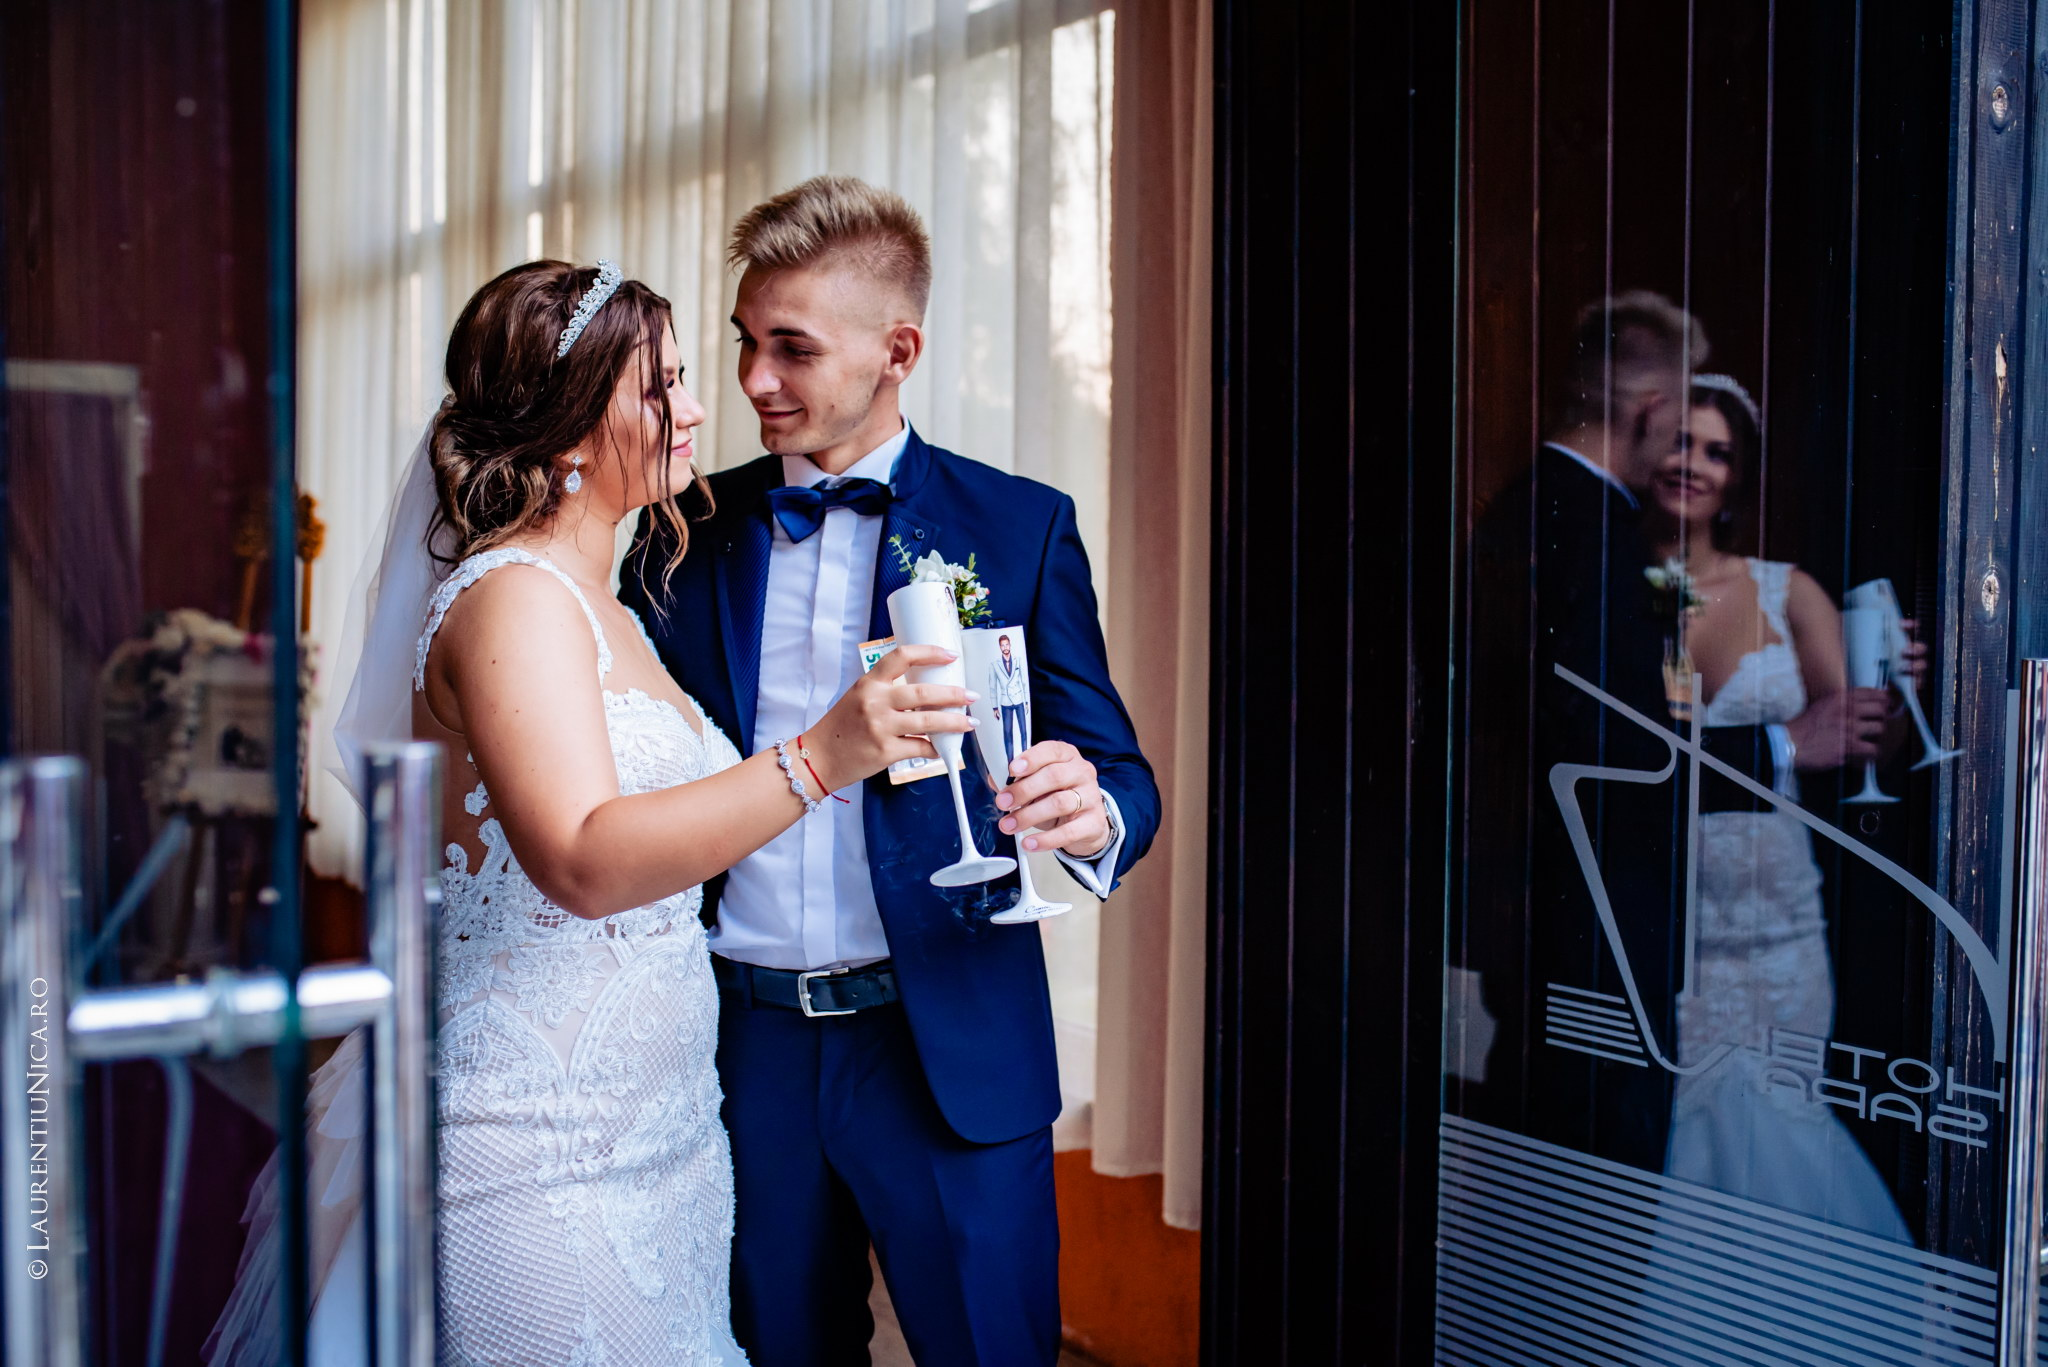 fotografii nunta Roxana si Cosmin fotograf nunta laurentiu nica 36 - Roxana & Cosmin | Fotografii nunta | Ticleni, judetul Gorj